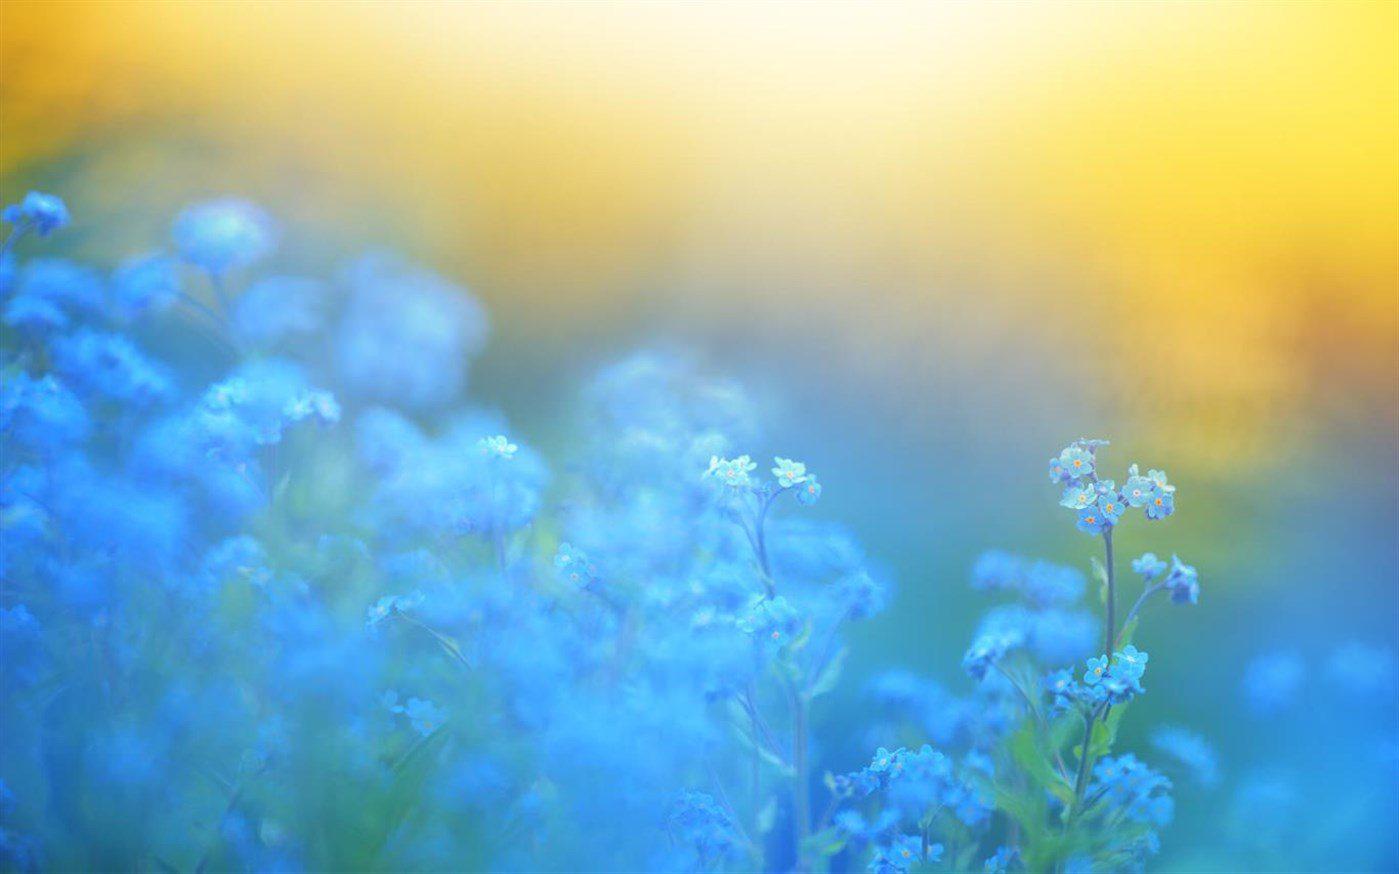 Windows 10 Theme: Download Microsoft's 'Flower Petals' theme pack 1